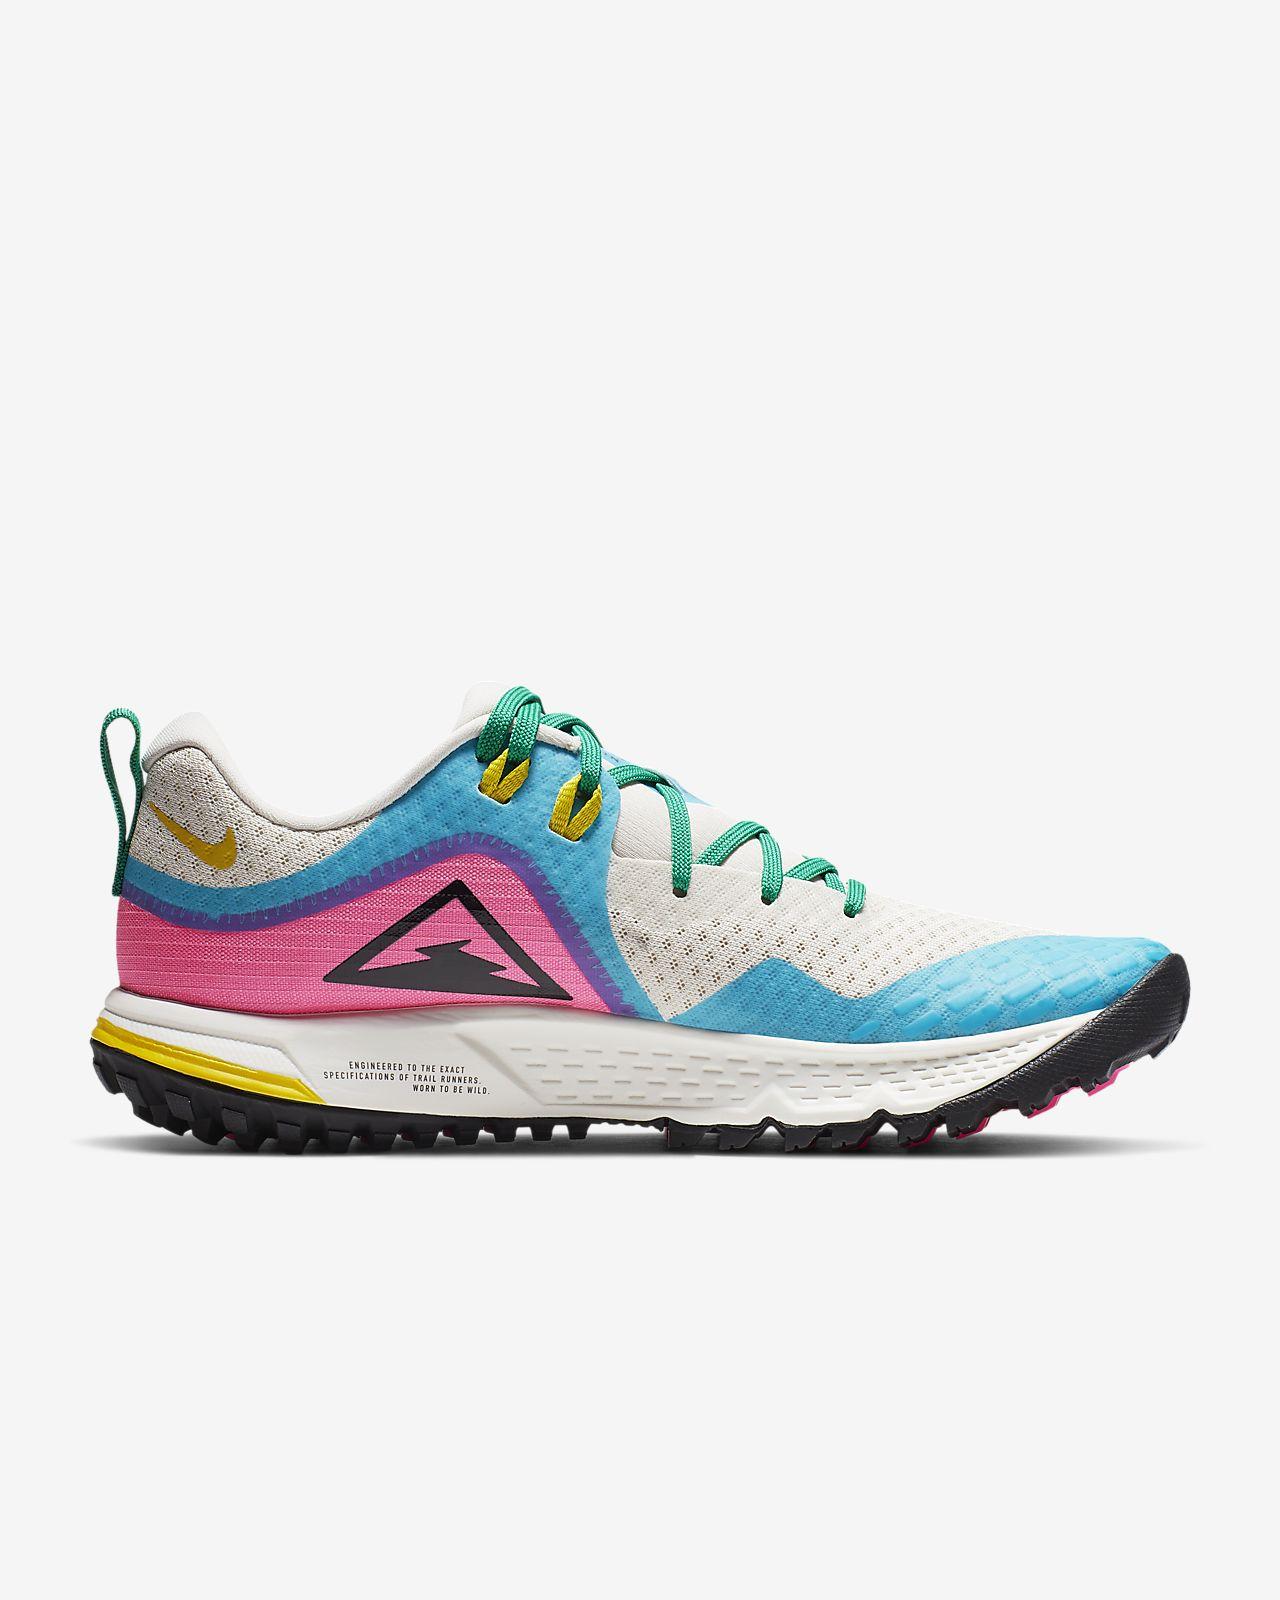 sports shoes aa34b 0b64f ... Chaussure de running Nike Air Zoom Wildhorse 5 pour Femme